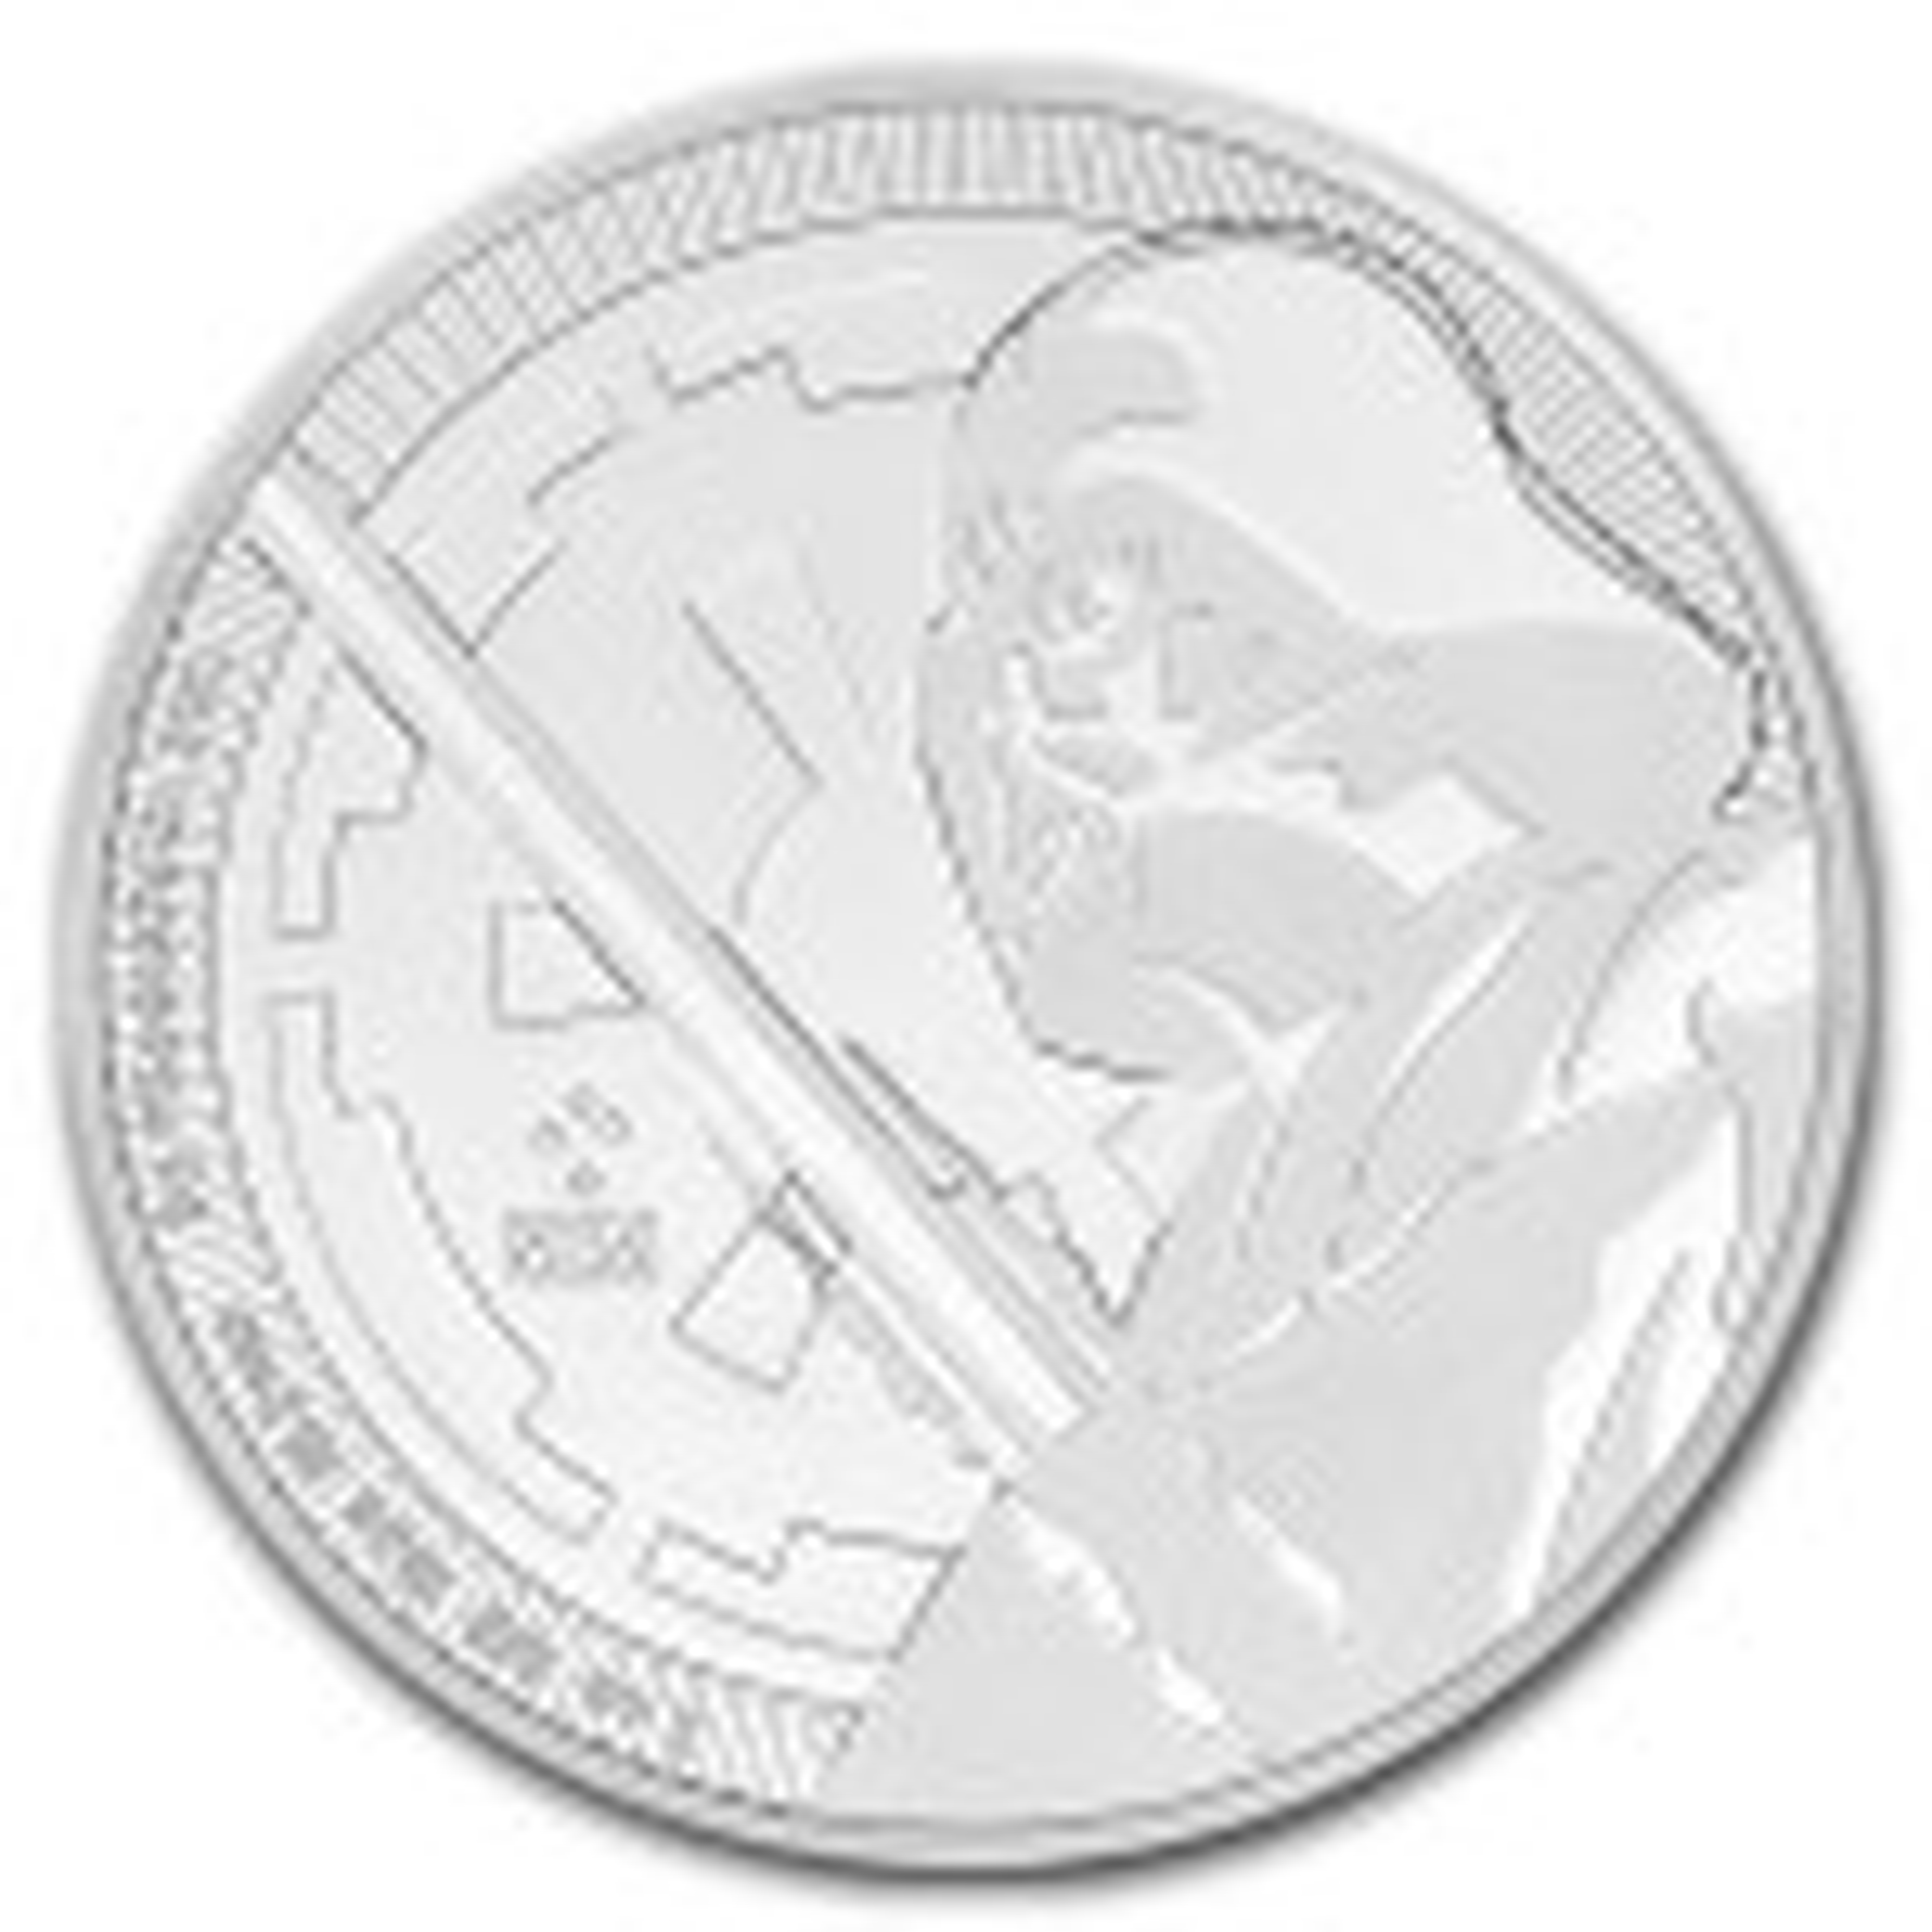 1 Troy ounce zilveren munt Star Wars Darth Vader 2018